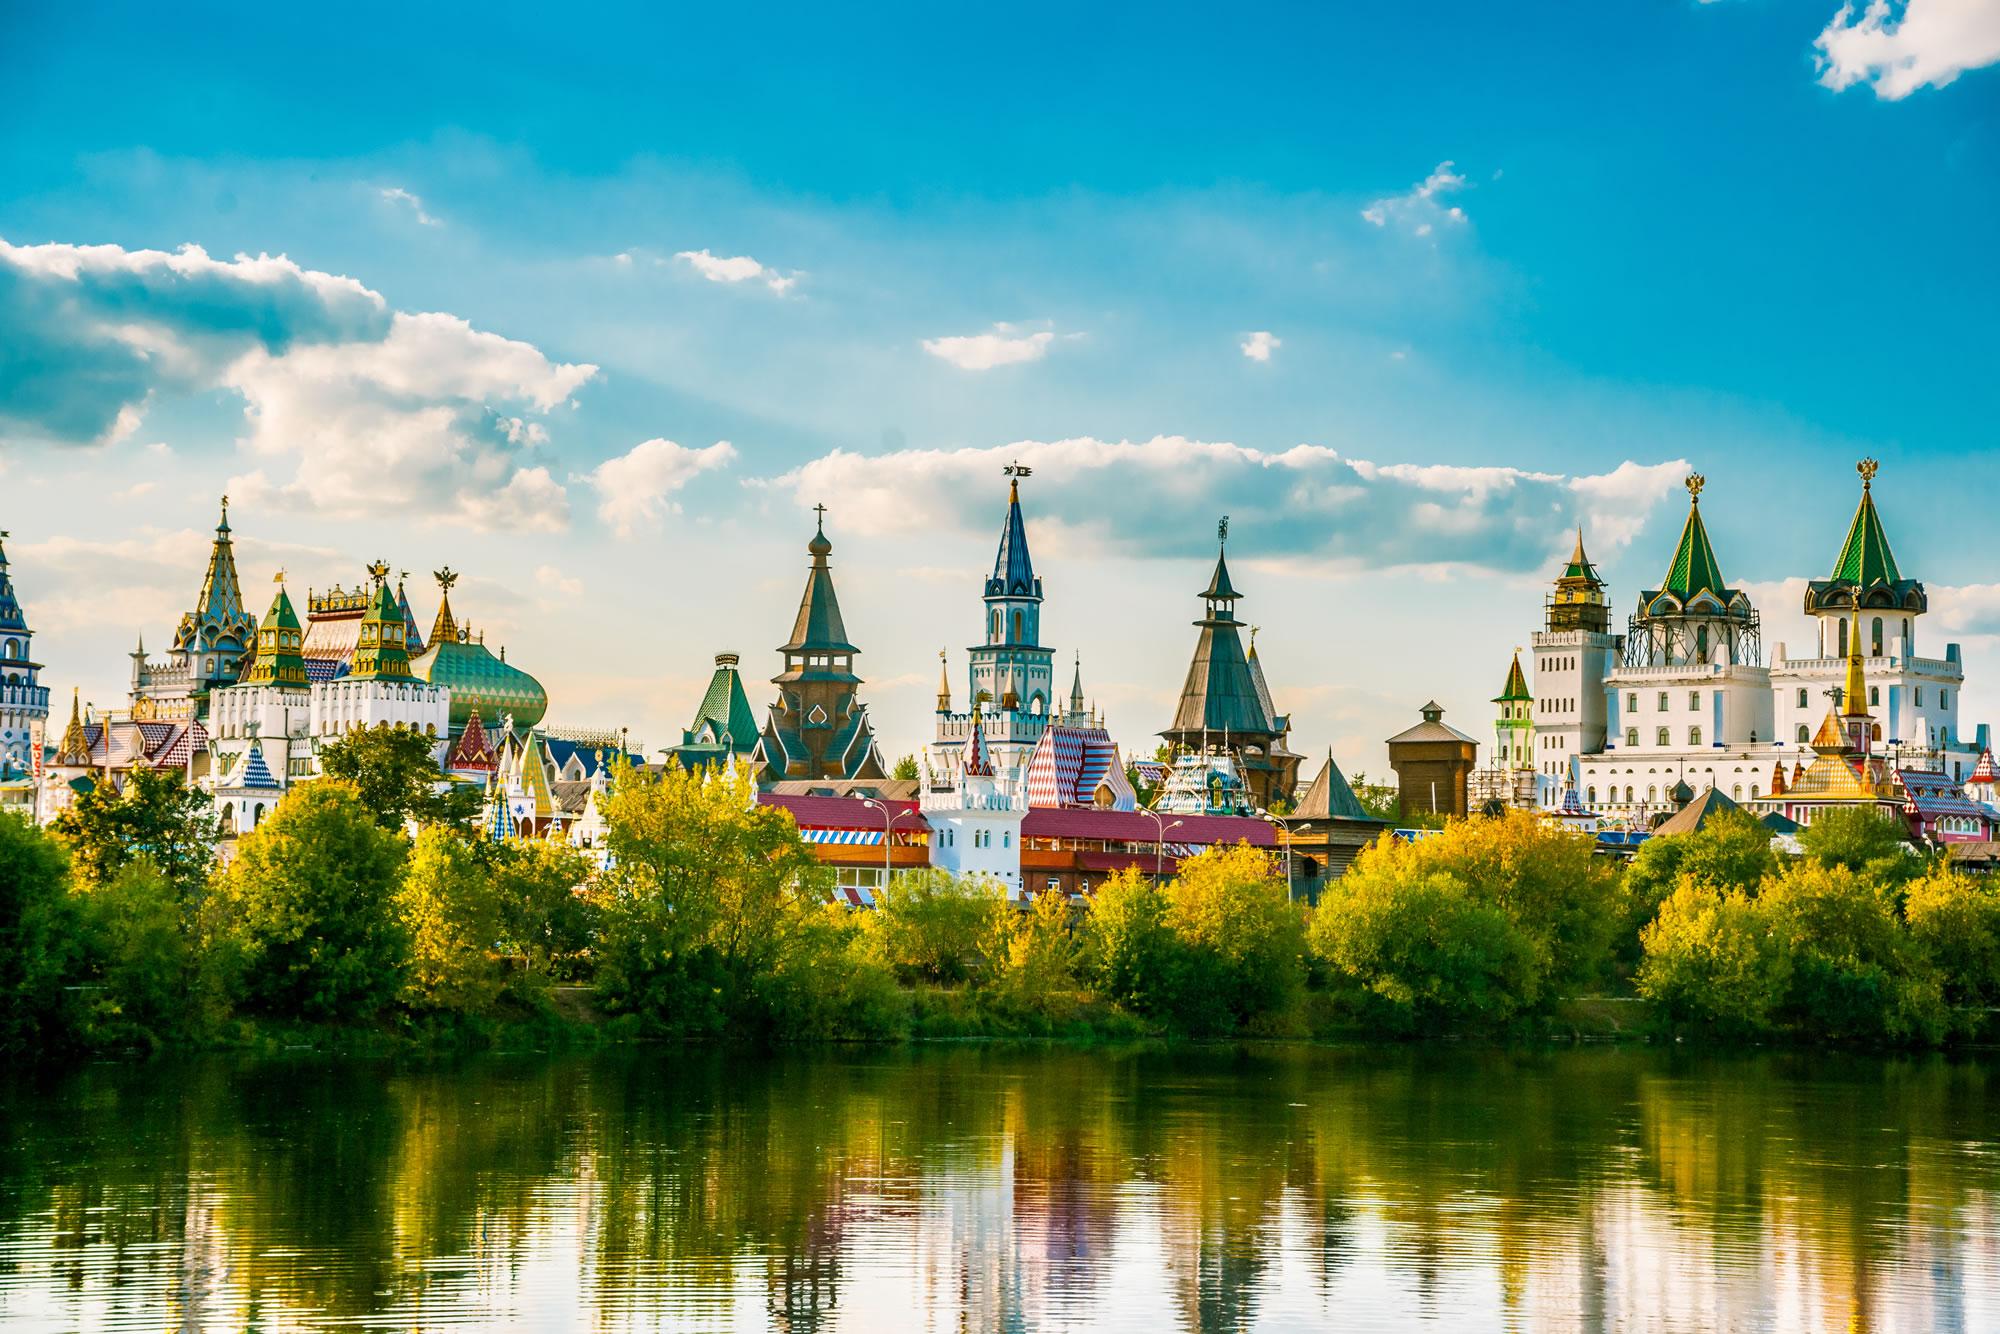 Izmaylovo Kremlin, Russia